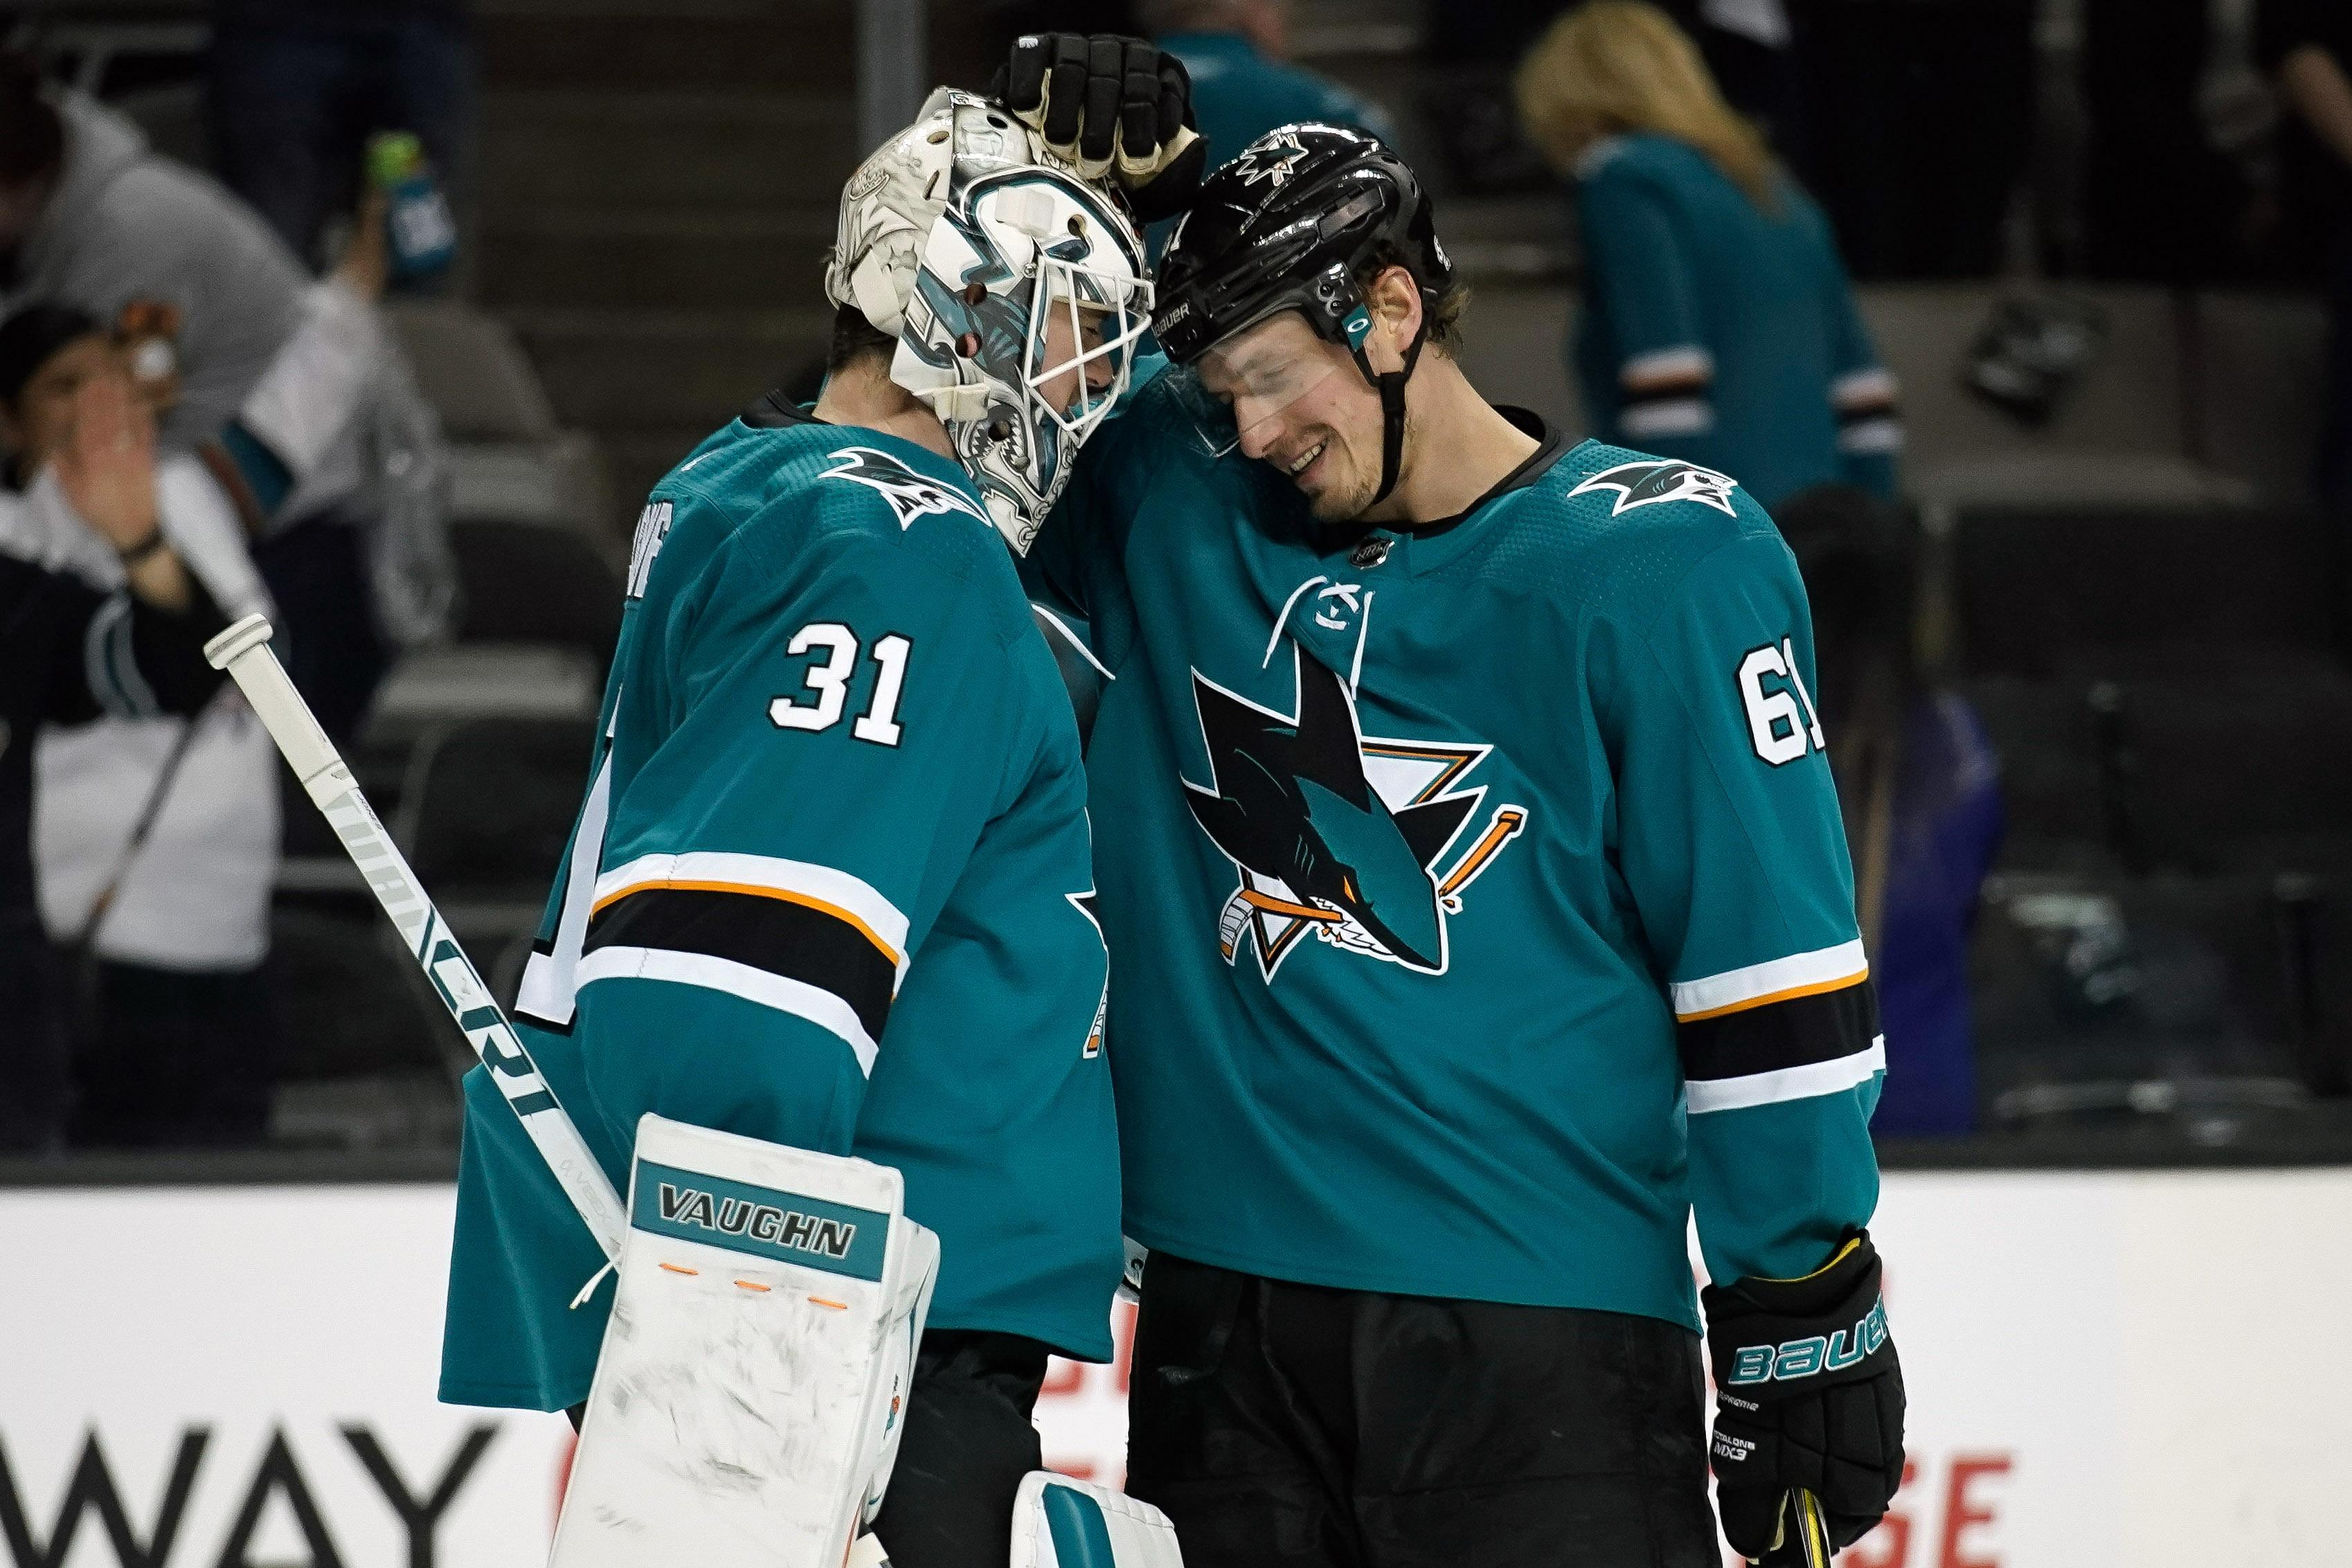 NHL: Vancouver Canucks at San Jose Sharks